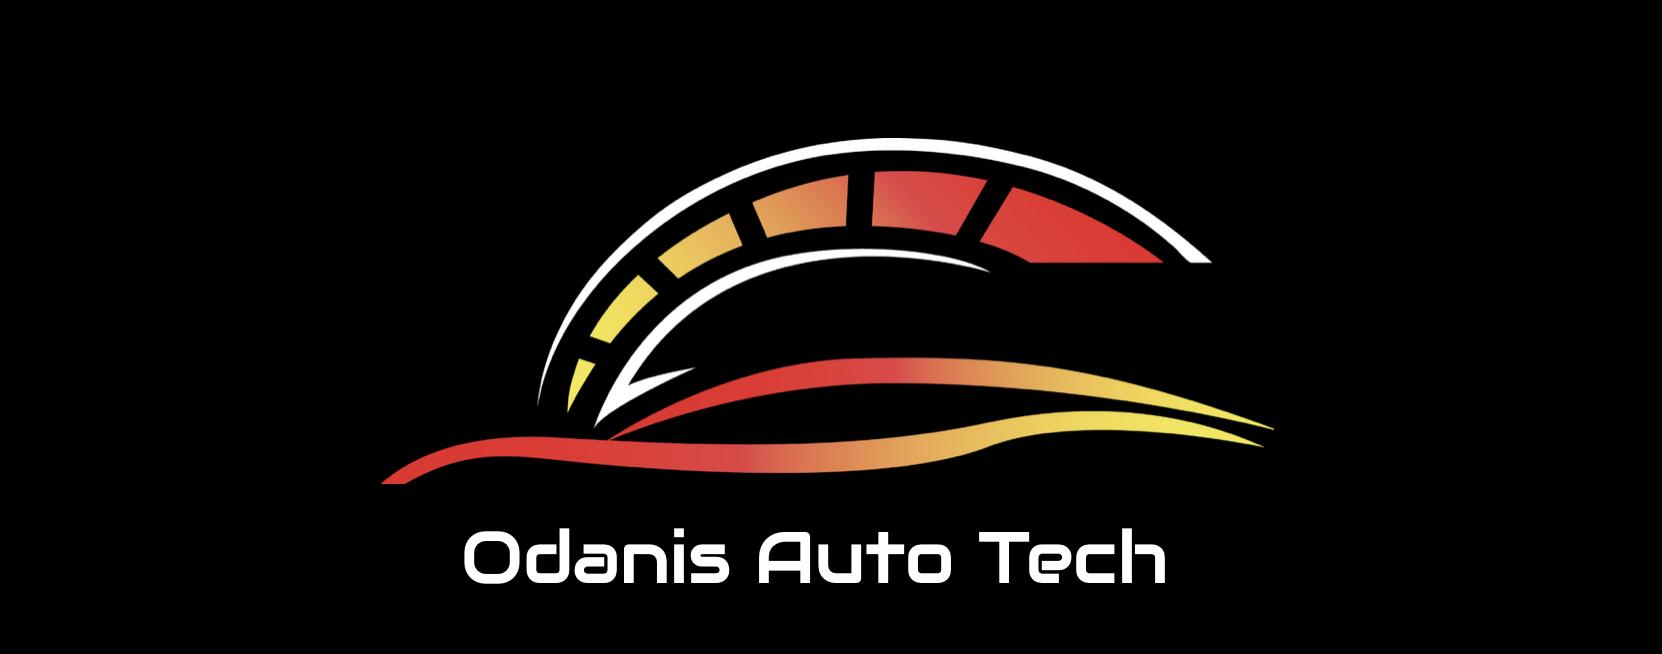 Odanis Auto Tech LLC